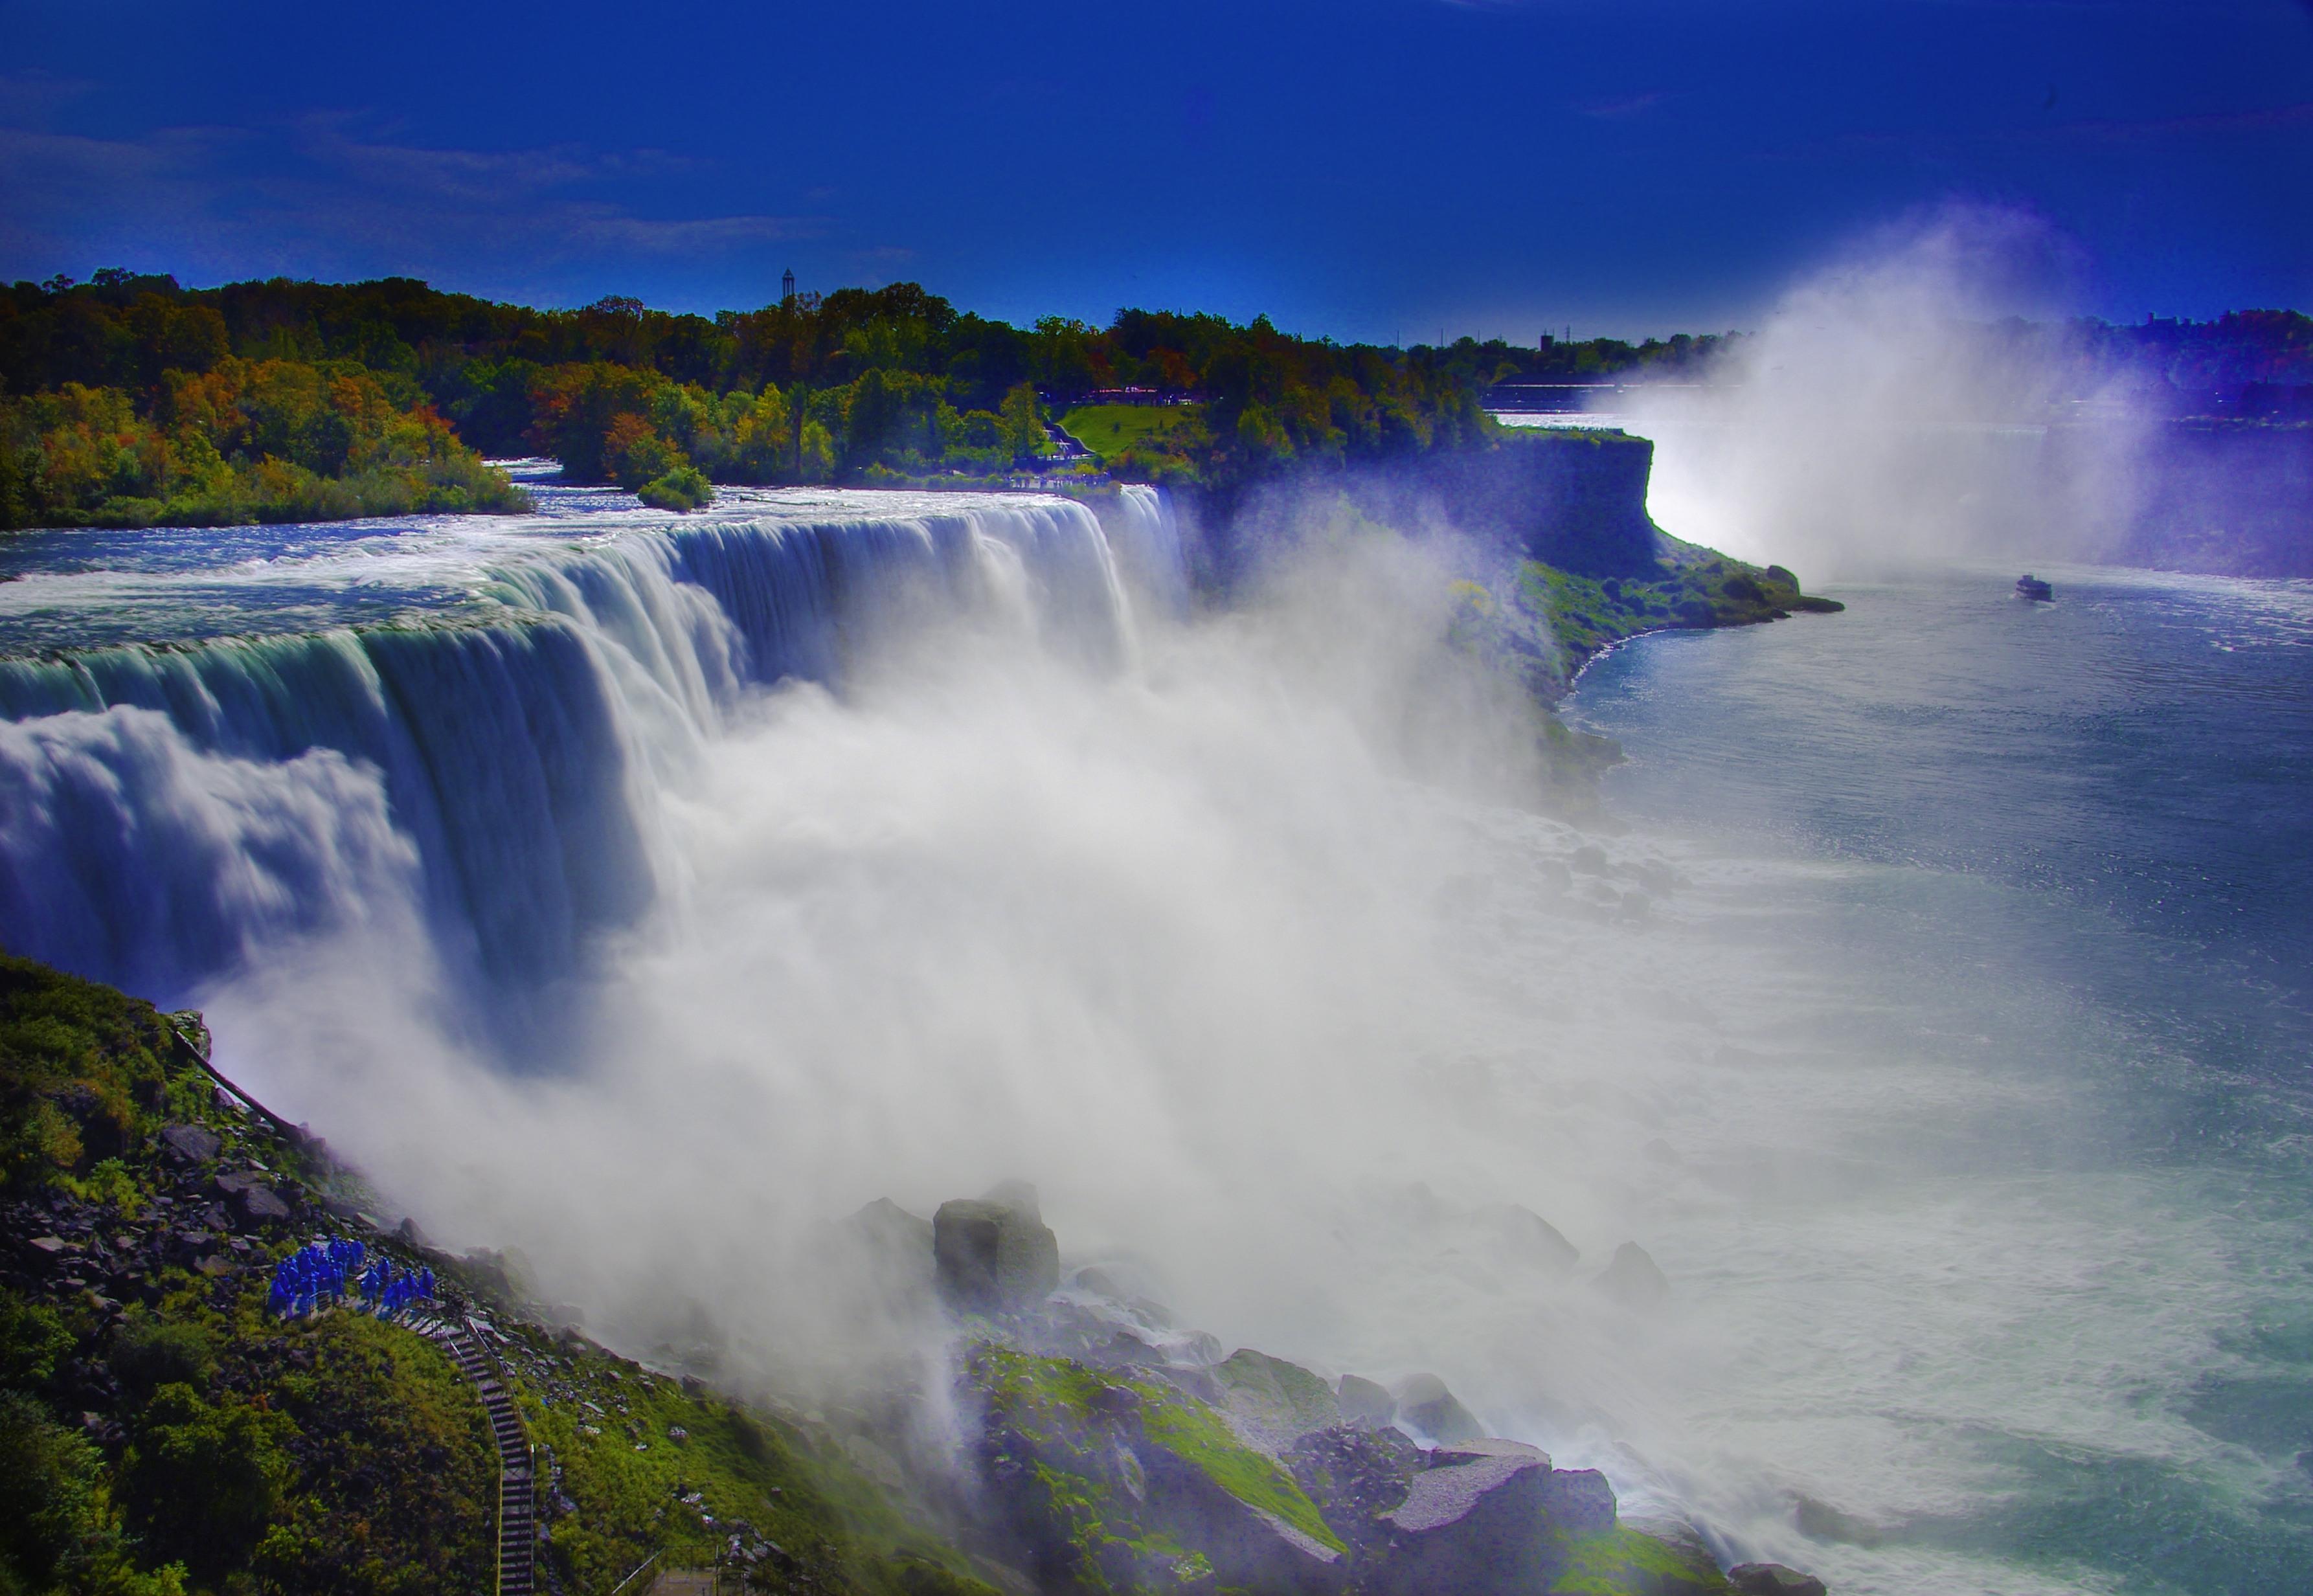 Beautiful Niagara Falls Wallpaper Awesome Niagara Falls And Blue Sky Picture High Definition